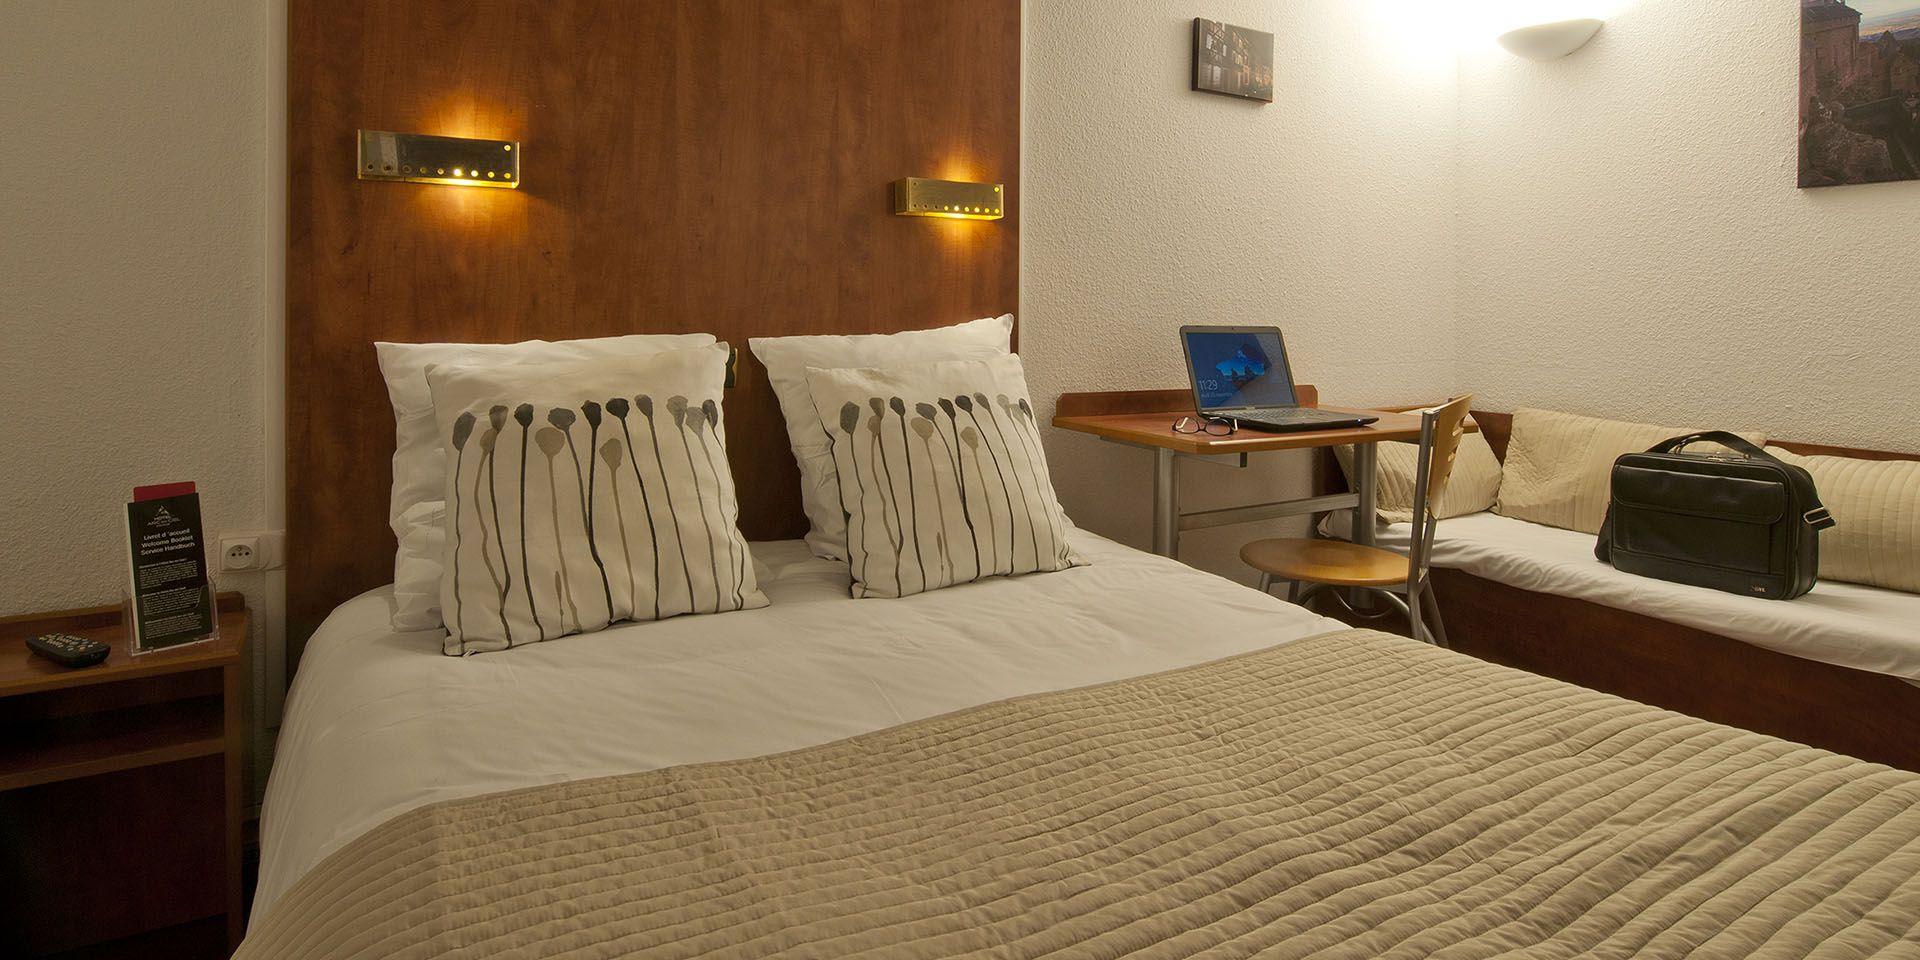 h tel colmar l 39 h tel arc en ciel 2 toiles colmar. Black Bedroom Furniture Sets. Home Design Ideas